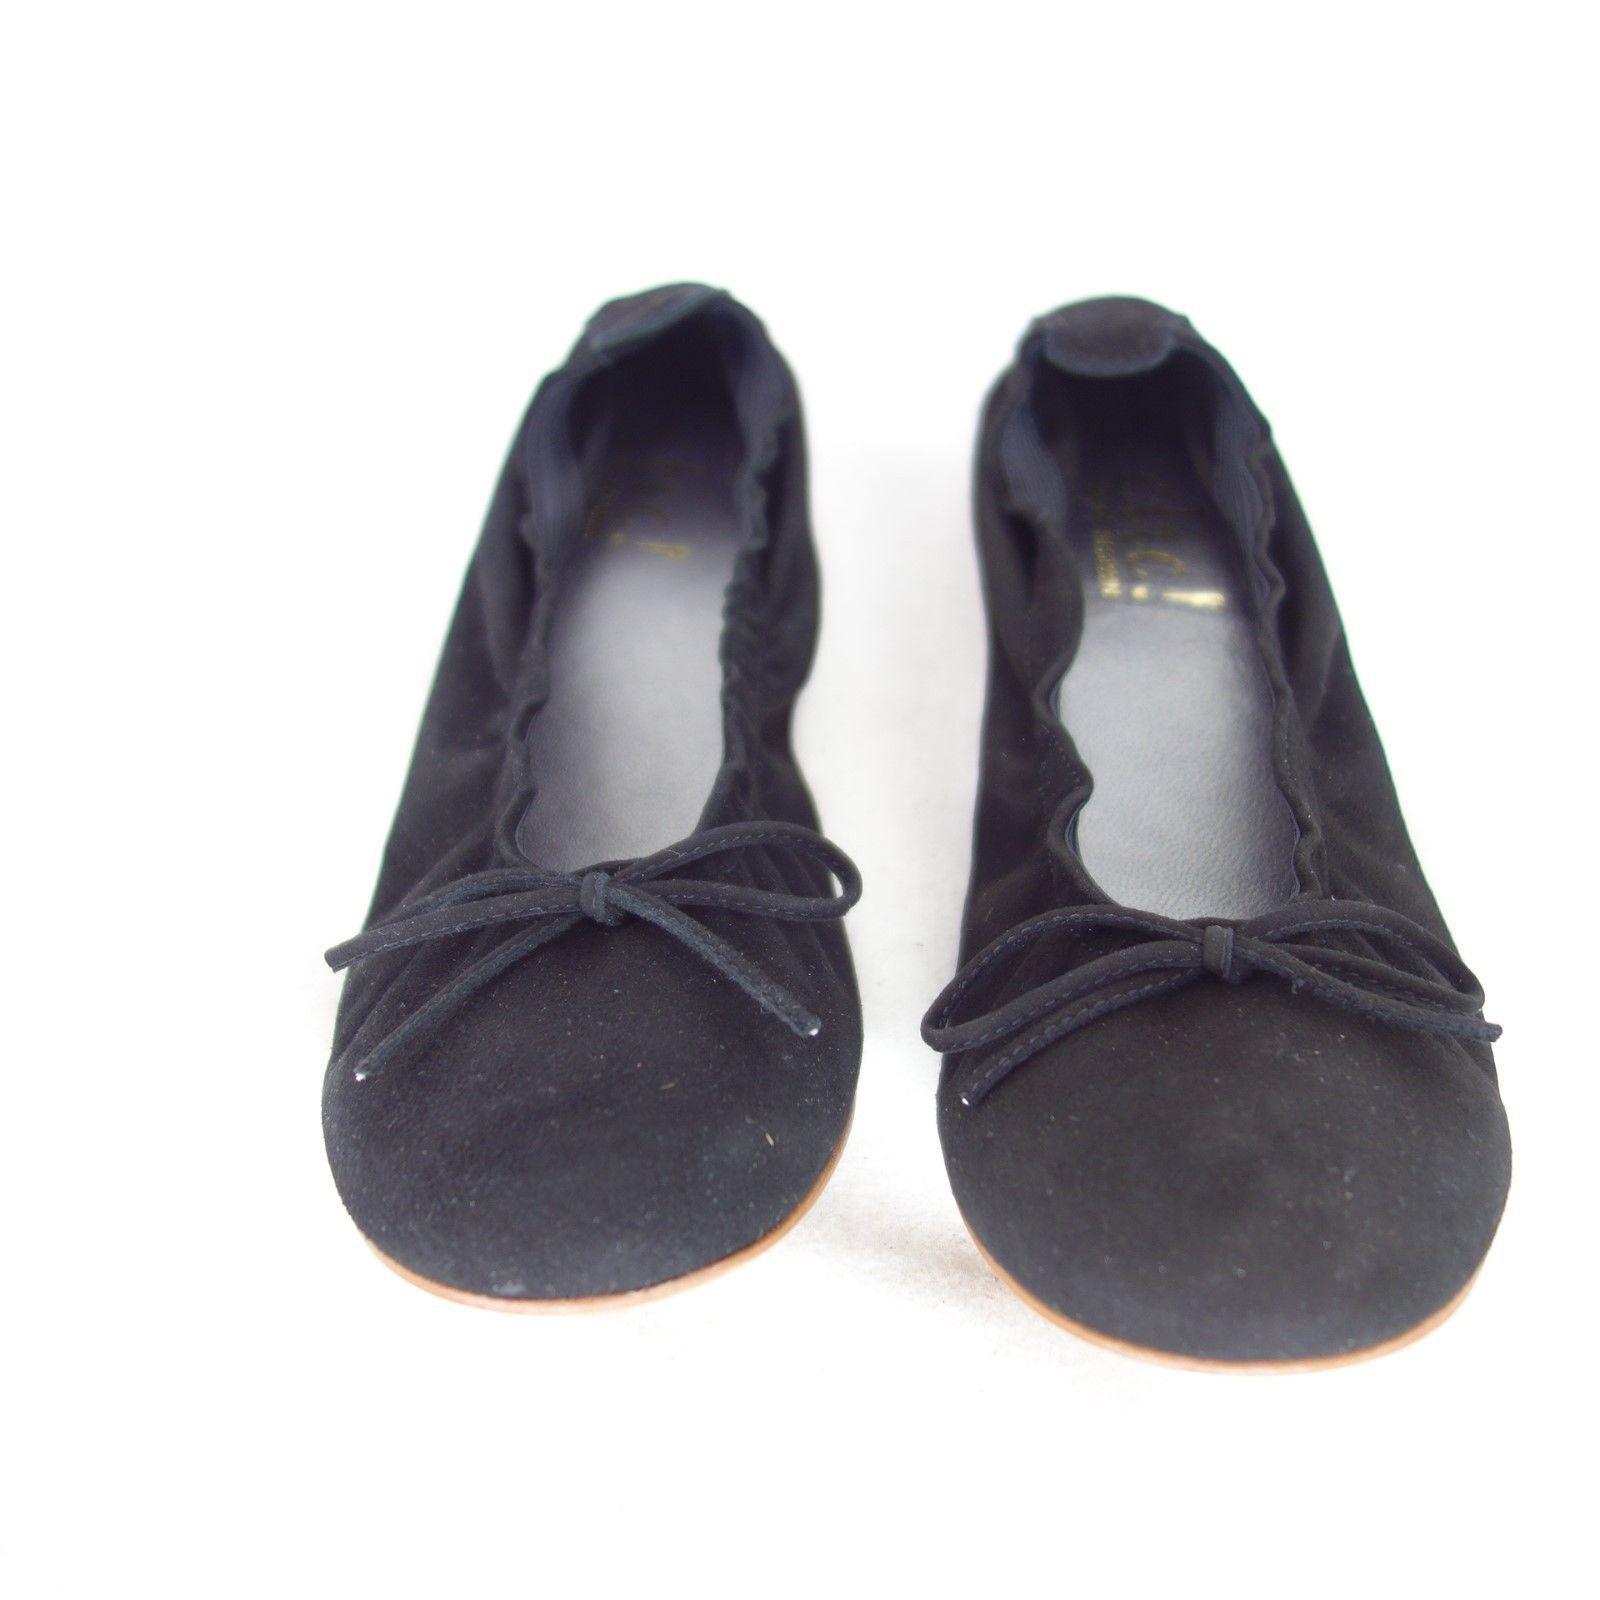 CLIC Damen Ballerinas Gr 35 Sandalen Schuhe Leder NEU Wildleder Schwarz NP 79 NEU Leder 4183e7